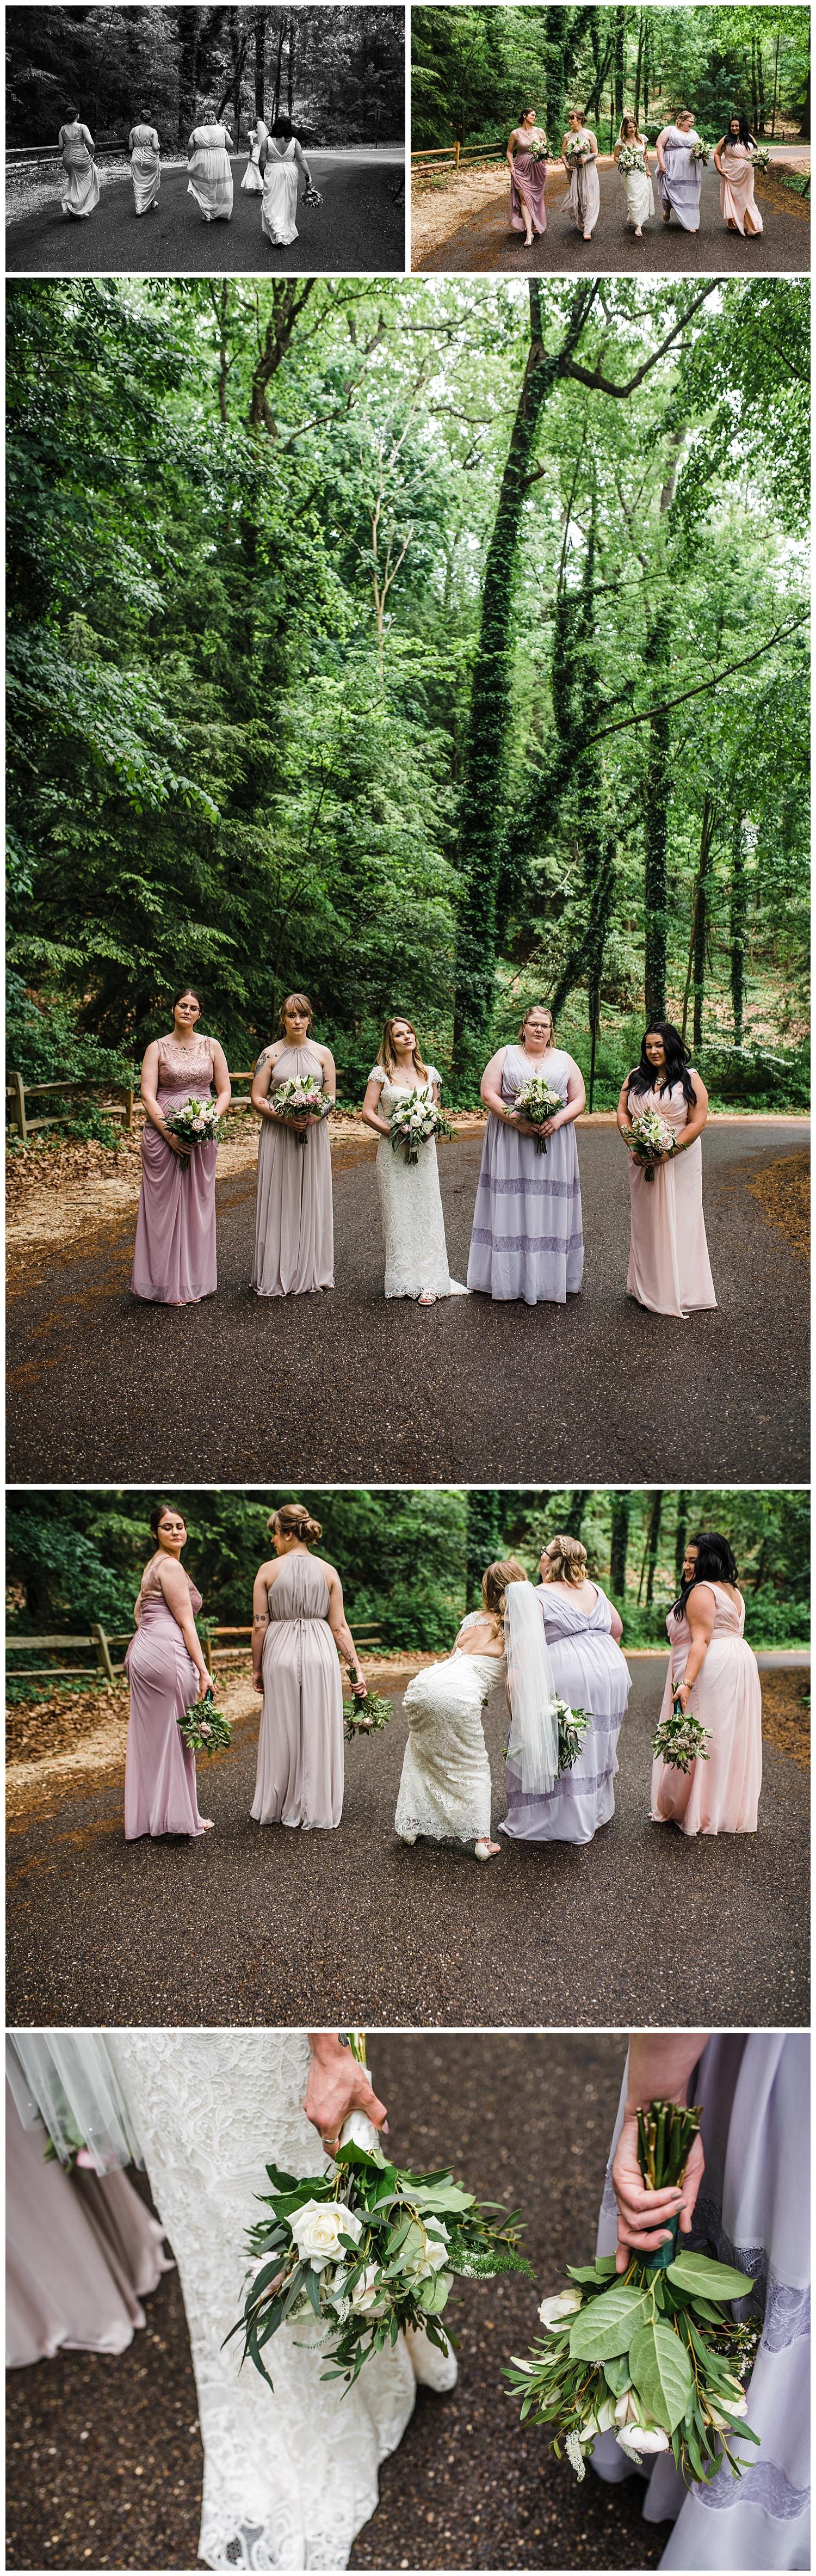 Cass + Reed | Intimate + Modern Ohio Wedding